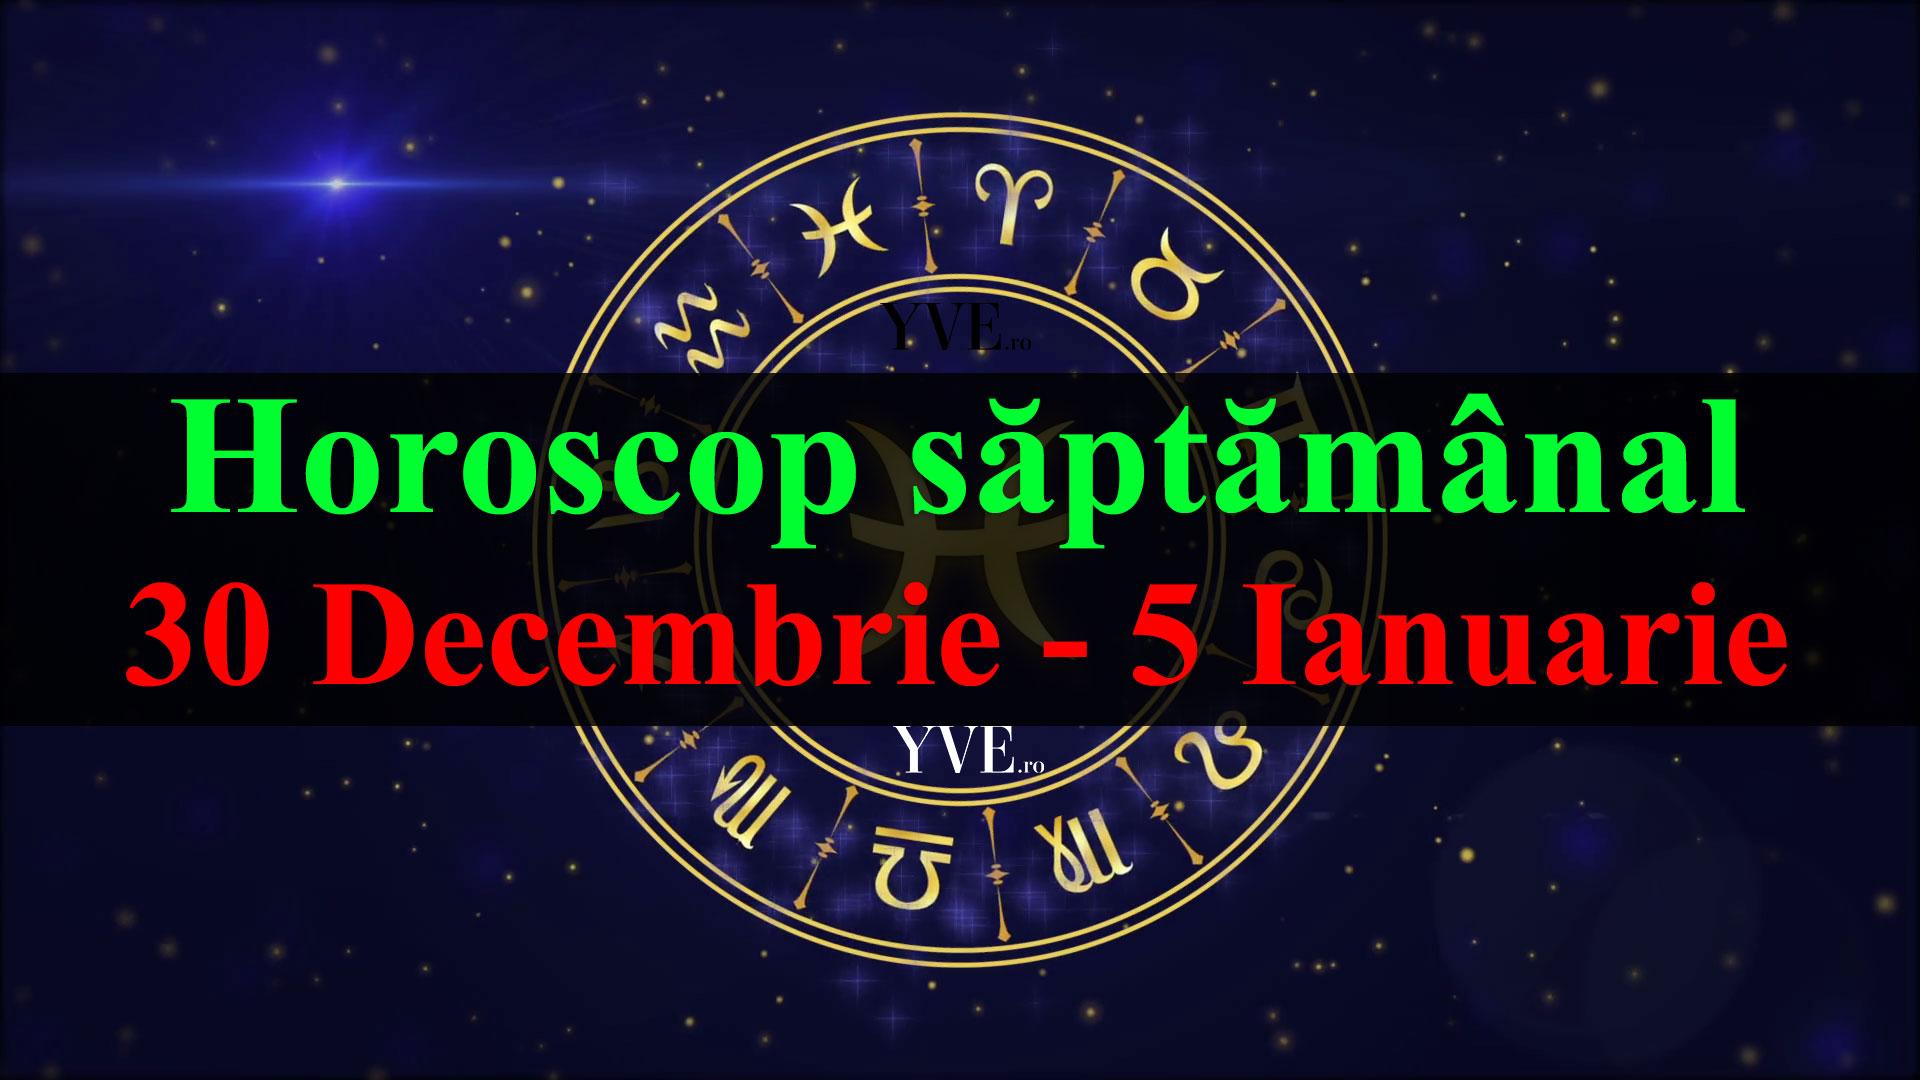 Horoscop saptamanal 30 Decembrie 2019 - 5 Ianuarie 2020